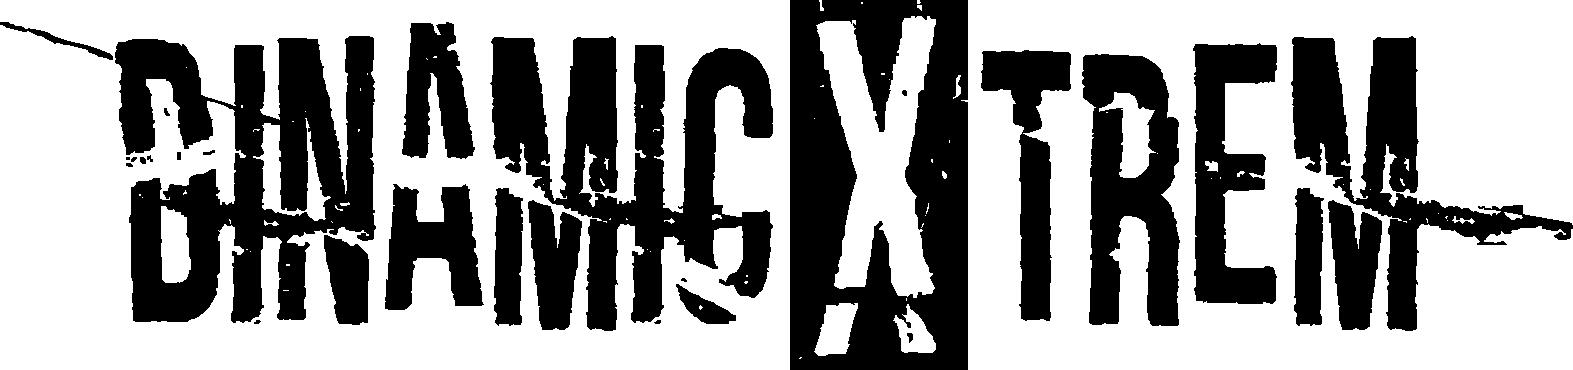 xtrem logo trans-03